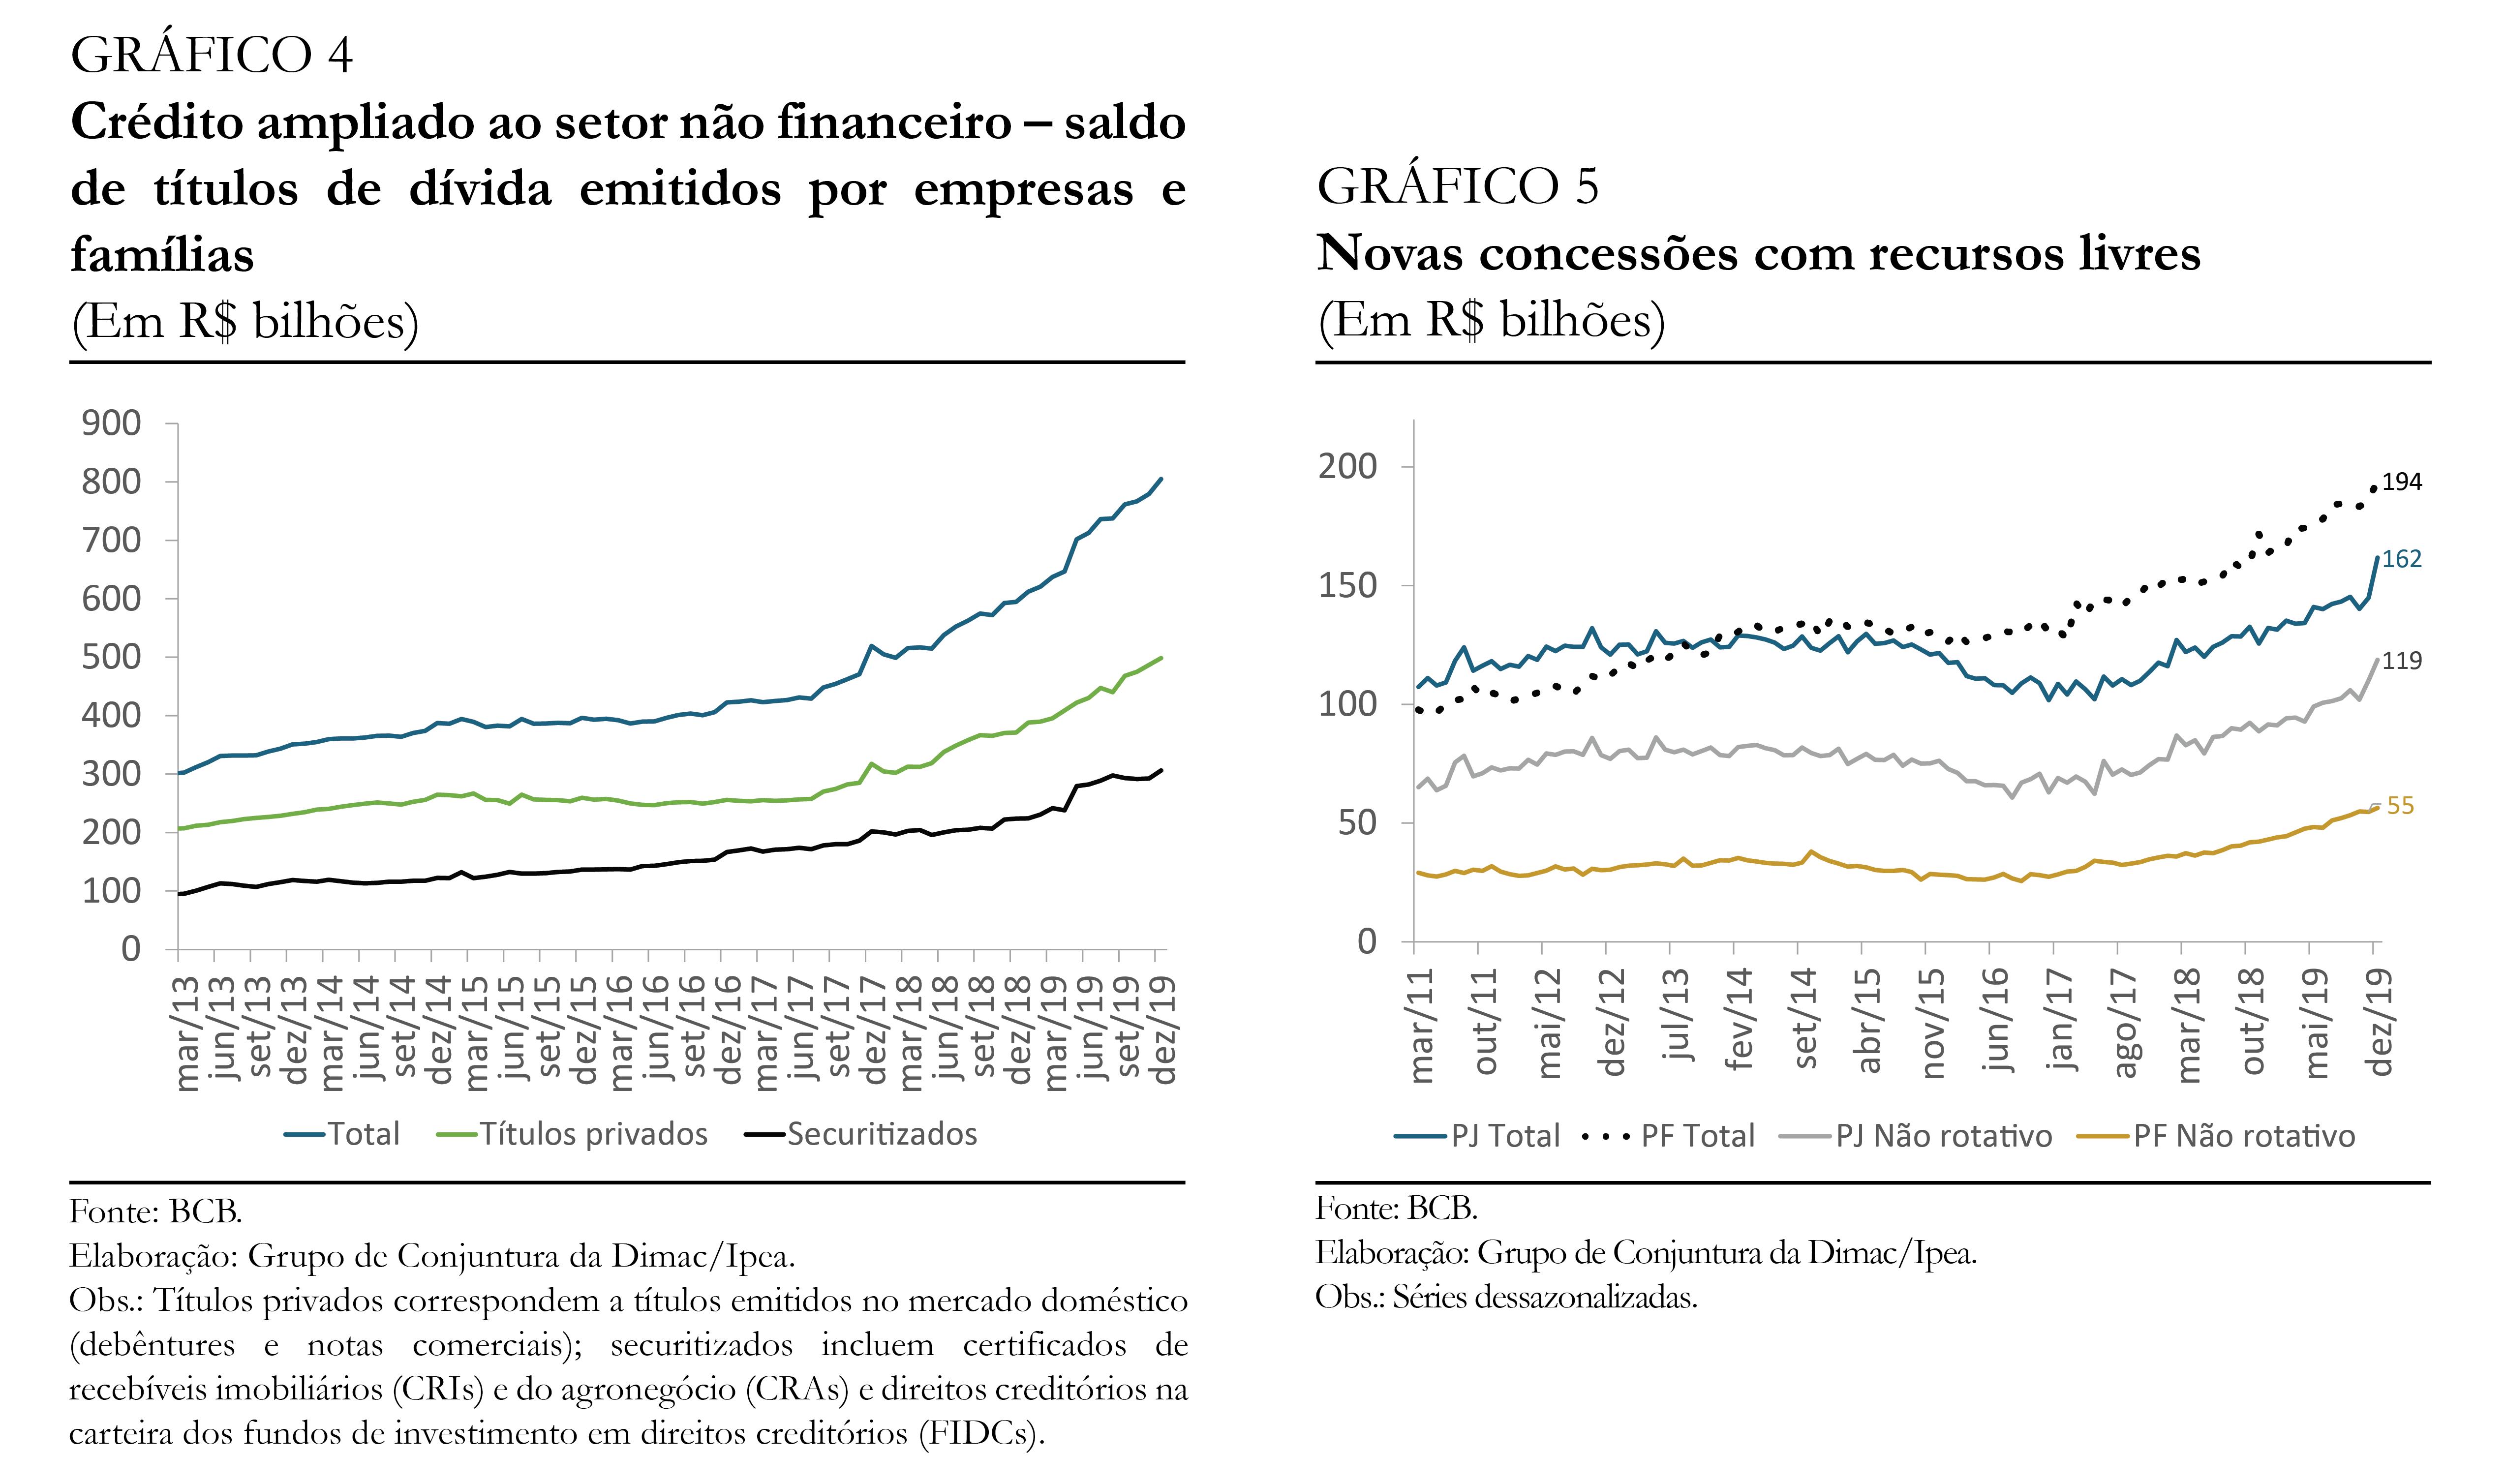 200213_cc_46_secao_credito_graficos_4_e_5